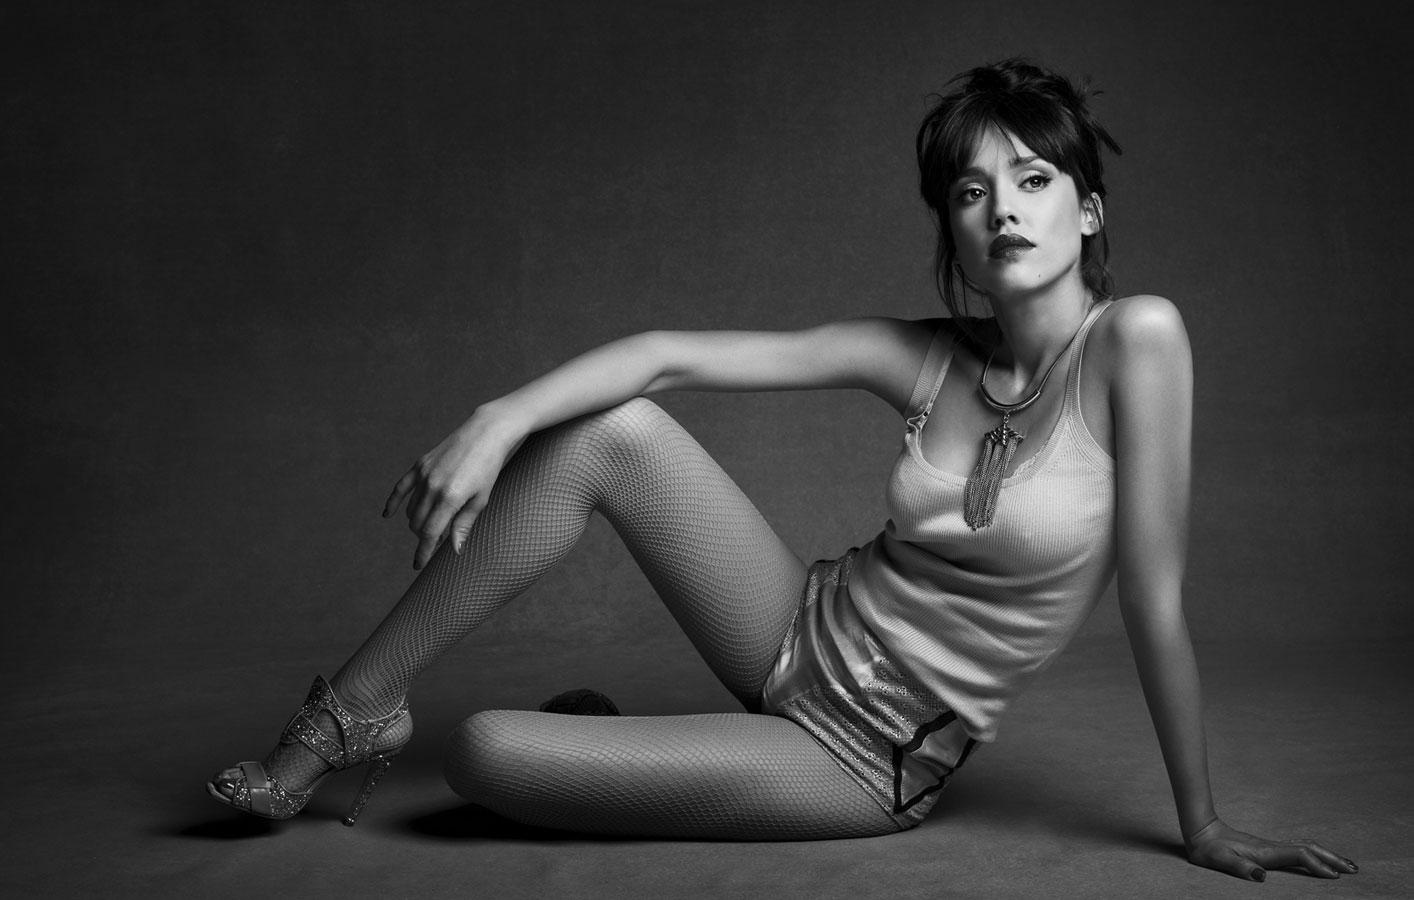 Jessica alba nyde legs spread open for that